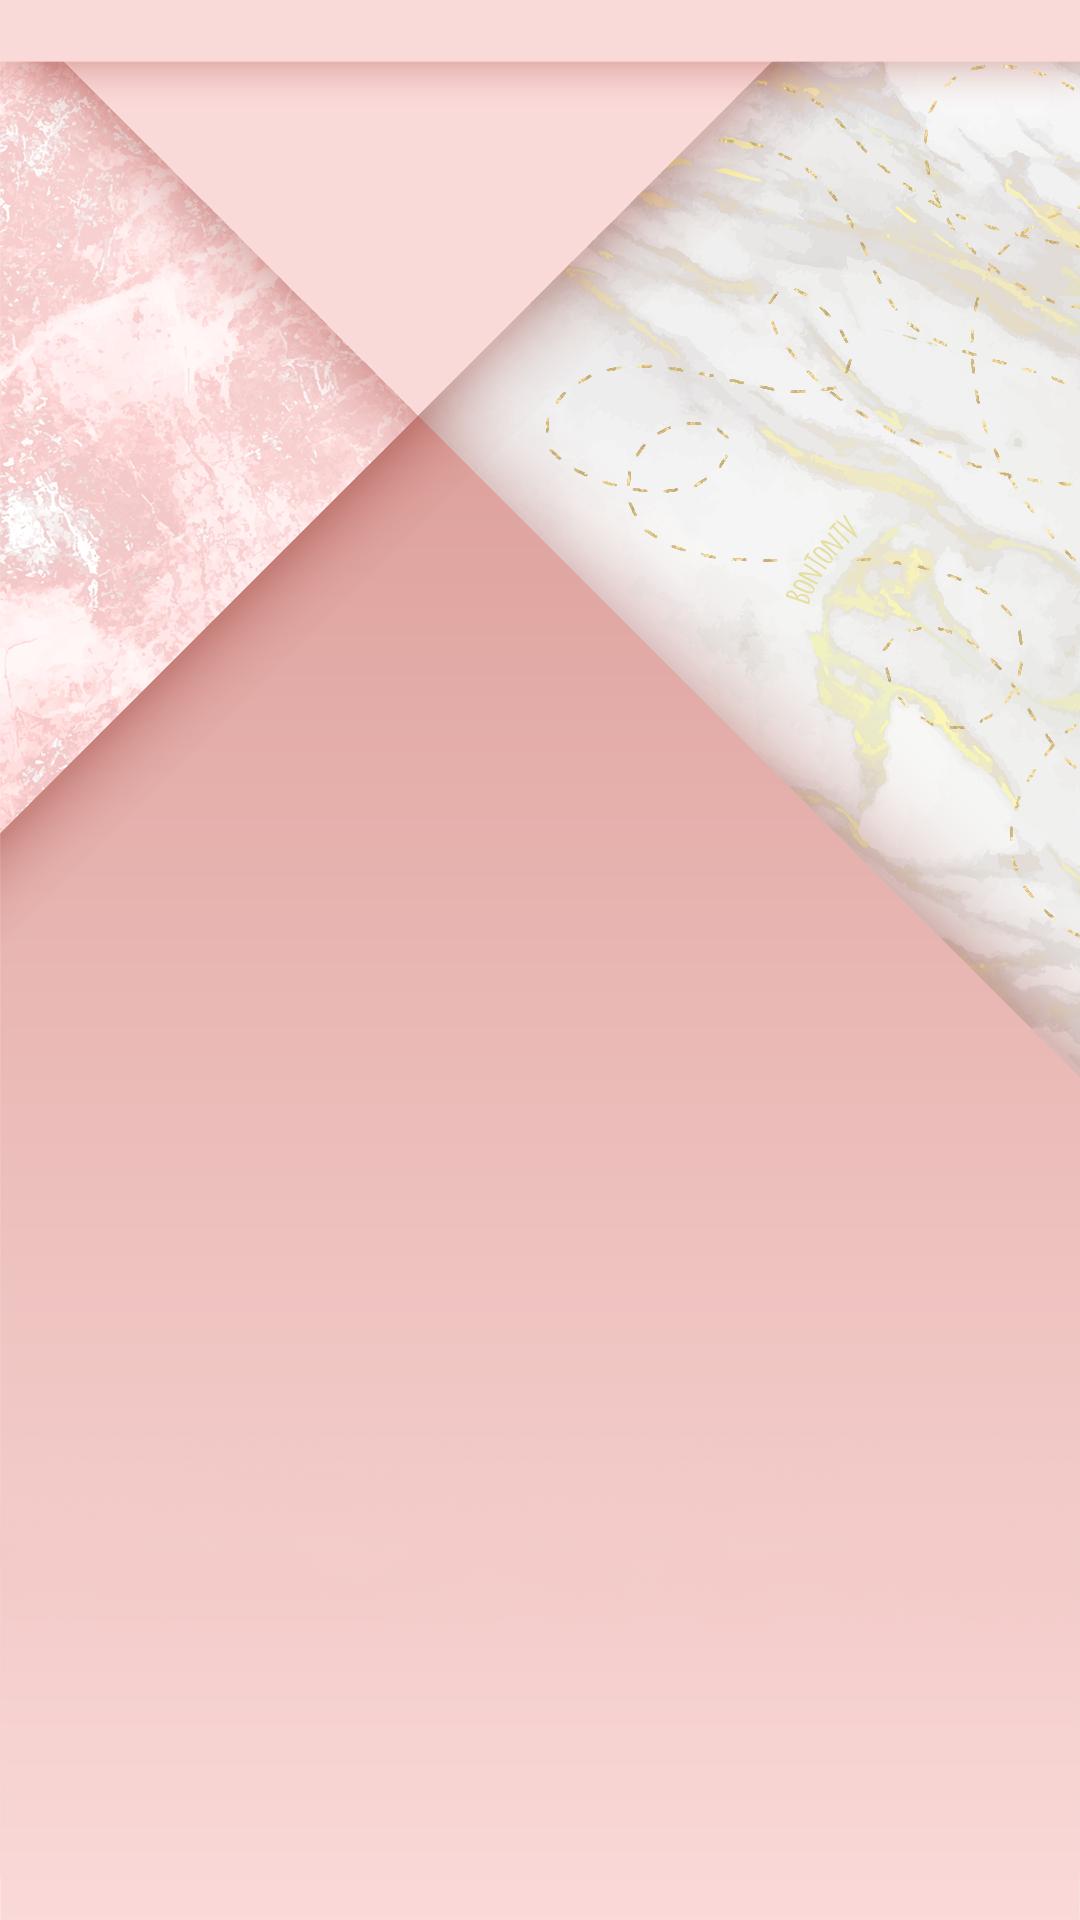 List of Cool Pink Phone Wallpaper HD 2020 by bontontv.com